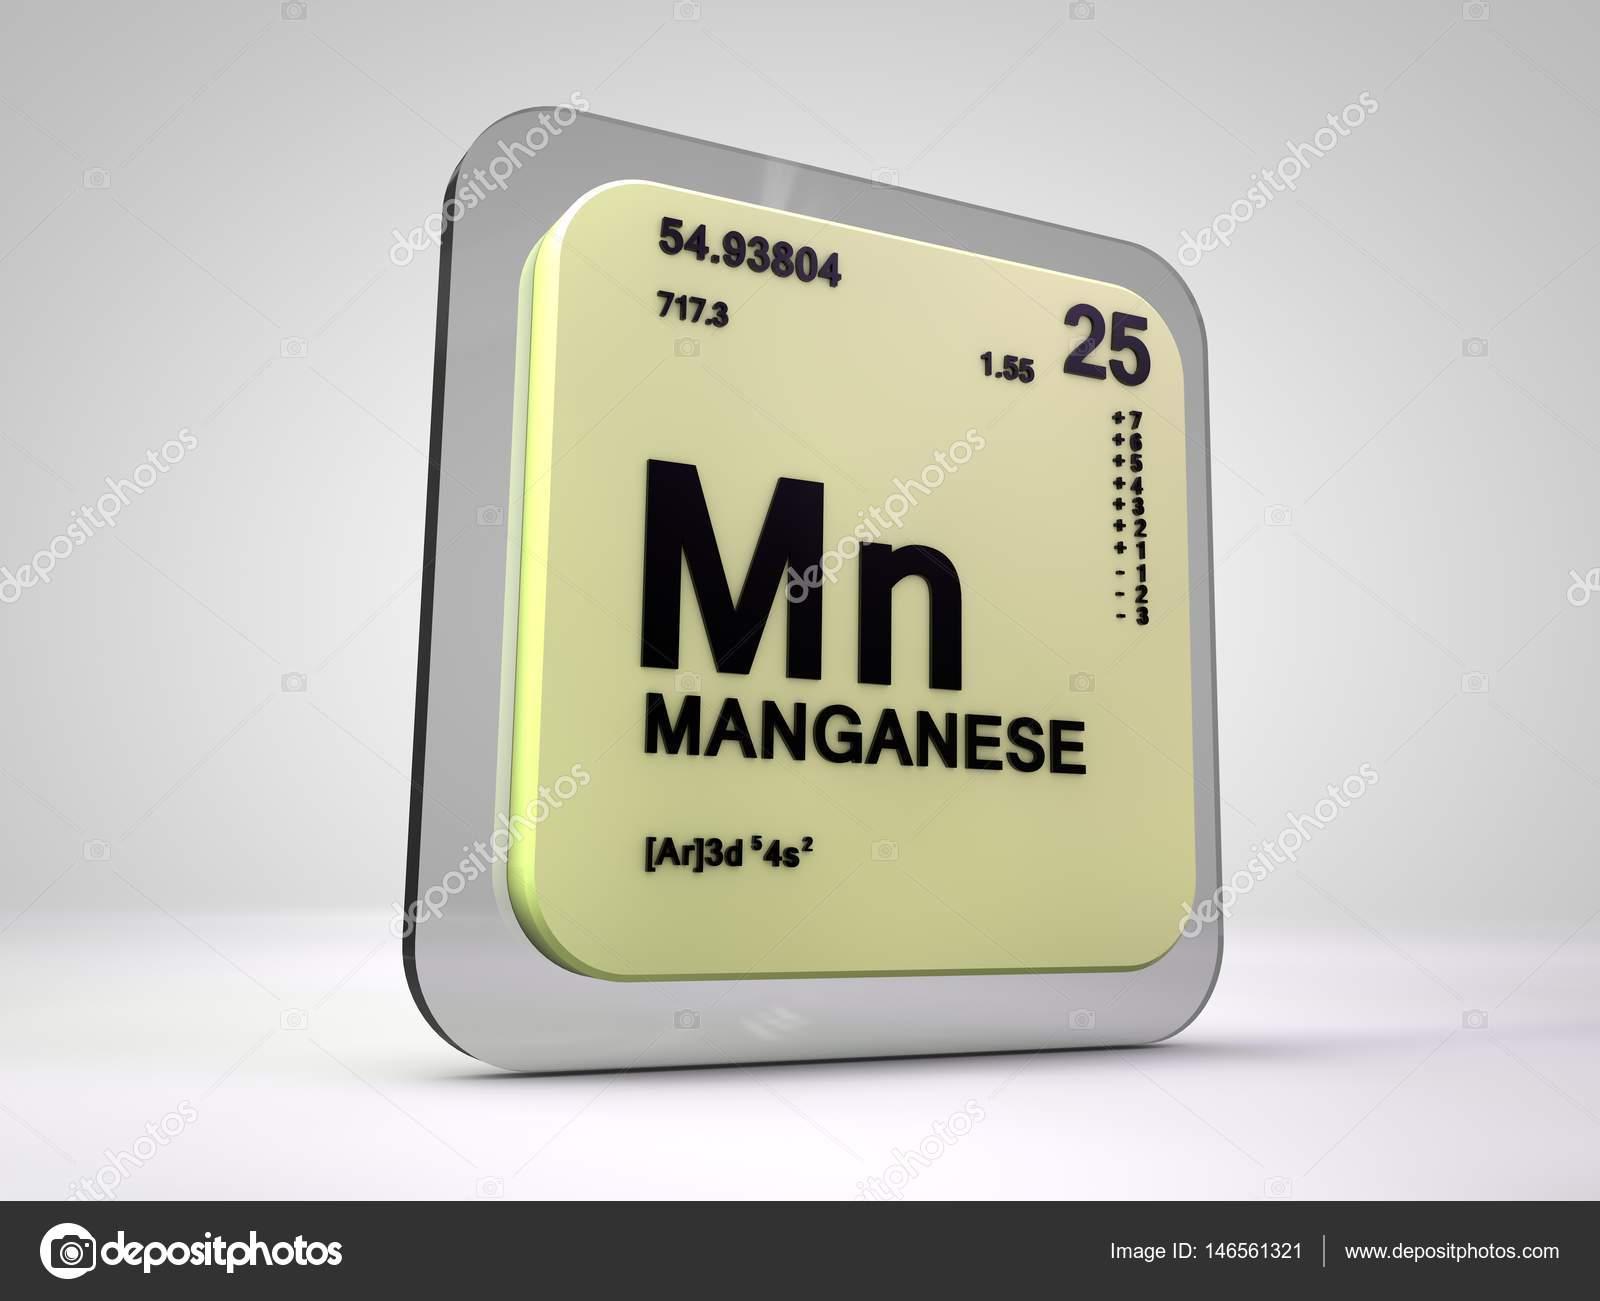 Manganeso mn elemento qumico tabla peridica 3d render foto manganeso mn elemento qumico tabla peridica 3d render foto de stock urtaz Choice Image